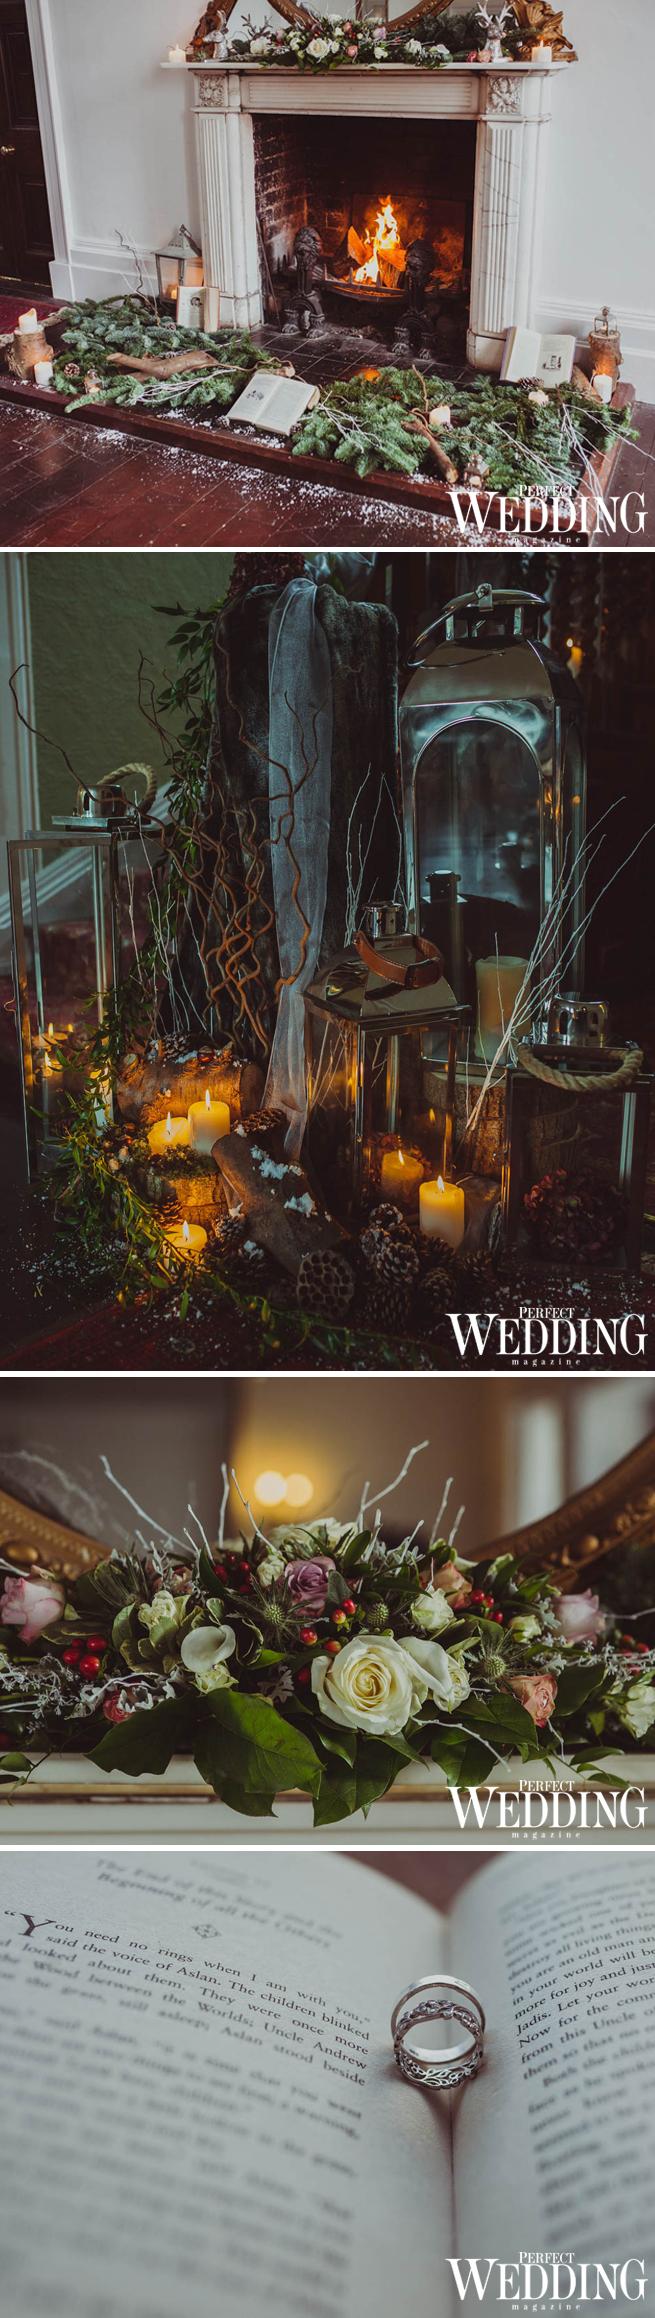 Winter Wedding, Winter Wedding Decor, Winter Floral Decor, UK Weddings, Tides Events, Perfect Wedding Magazine, Perfect Wedding Blog